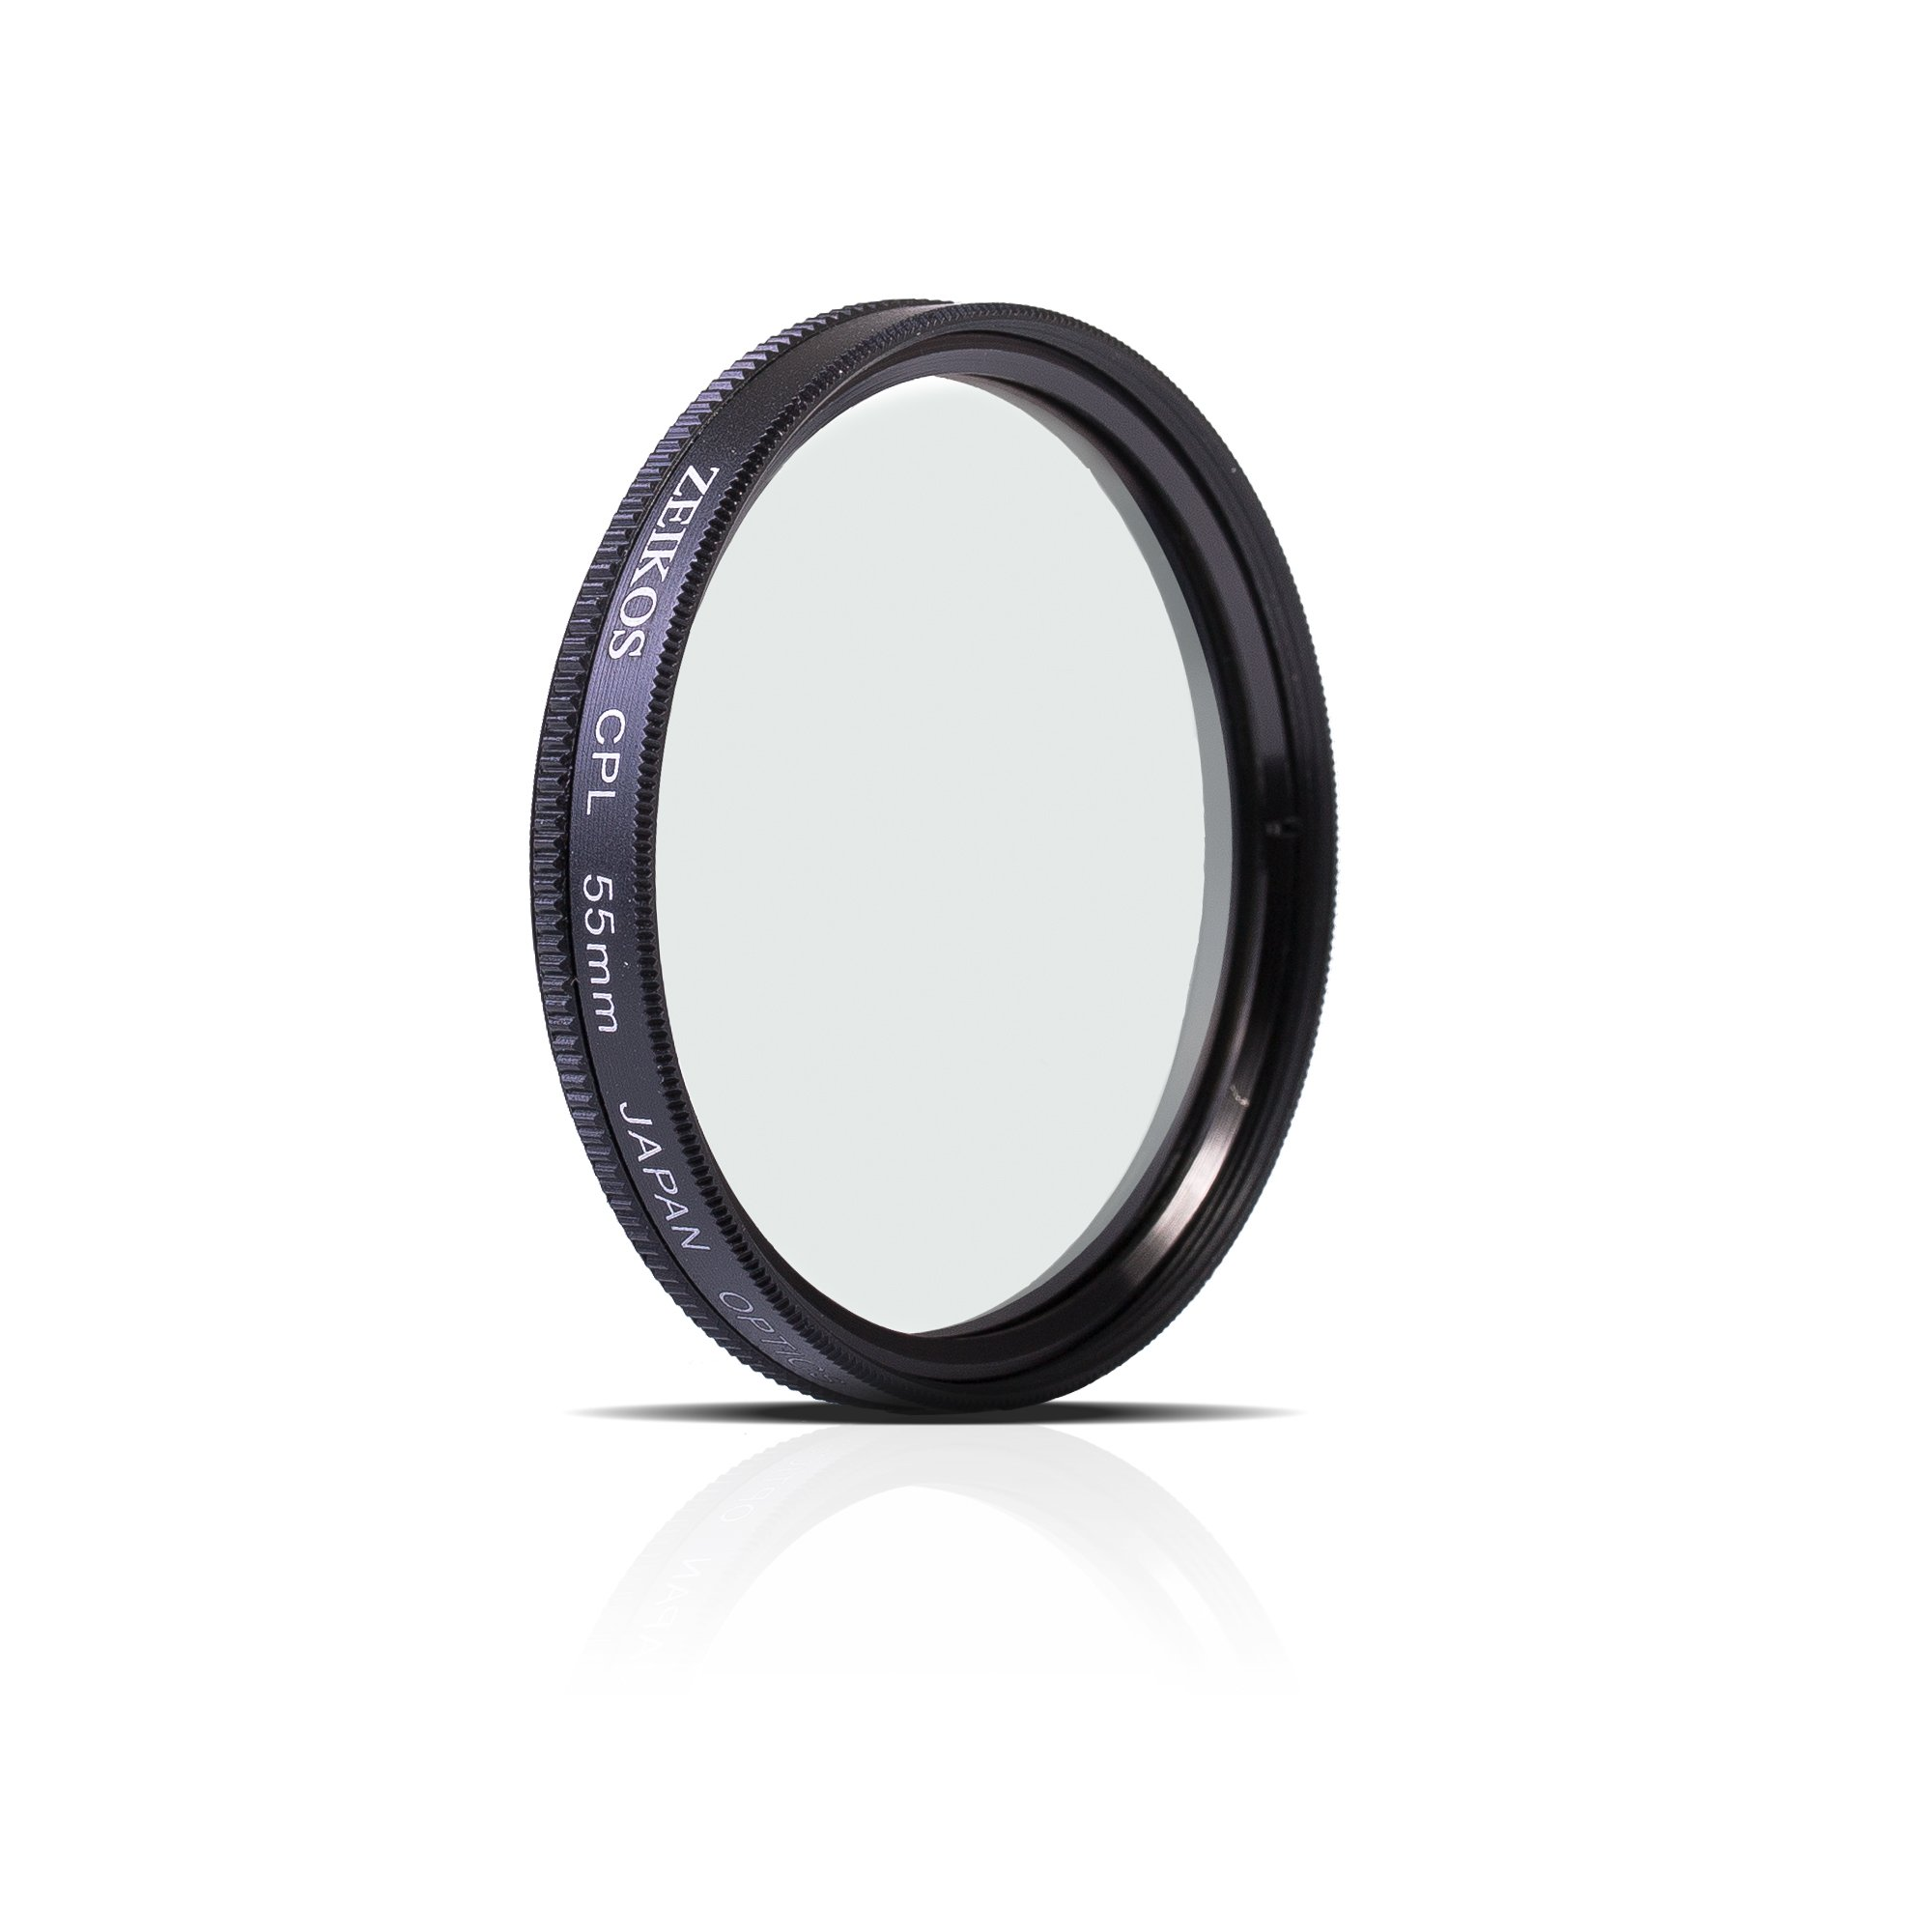 Zeikos 55mm Multi-Coated Circular Polarizer CPL Glass Filter w/ Rotating Mount For Nikon AF-P DX NIKKOR 18-55mm, Nikon 1 NIKKOR 10-100mm & Tamron AF 90mm f/2.8 Di by Zeikos